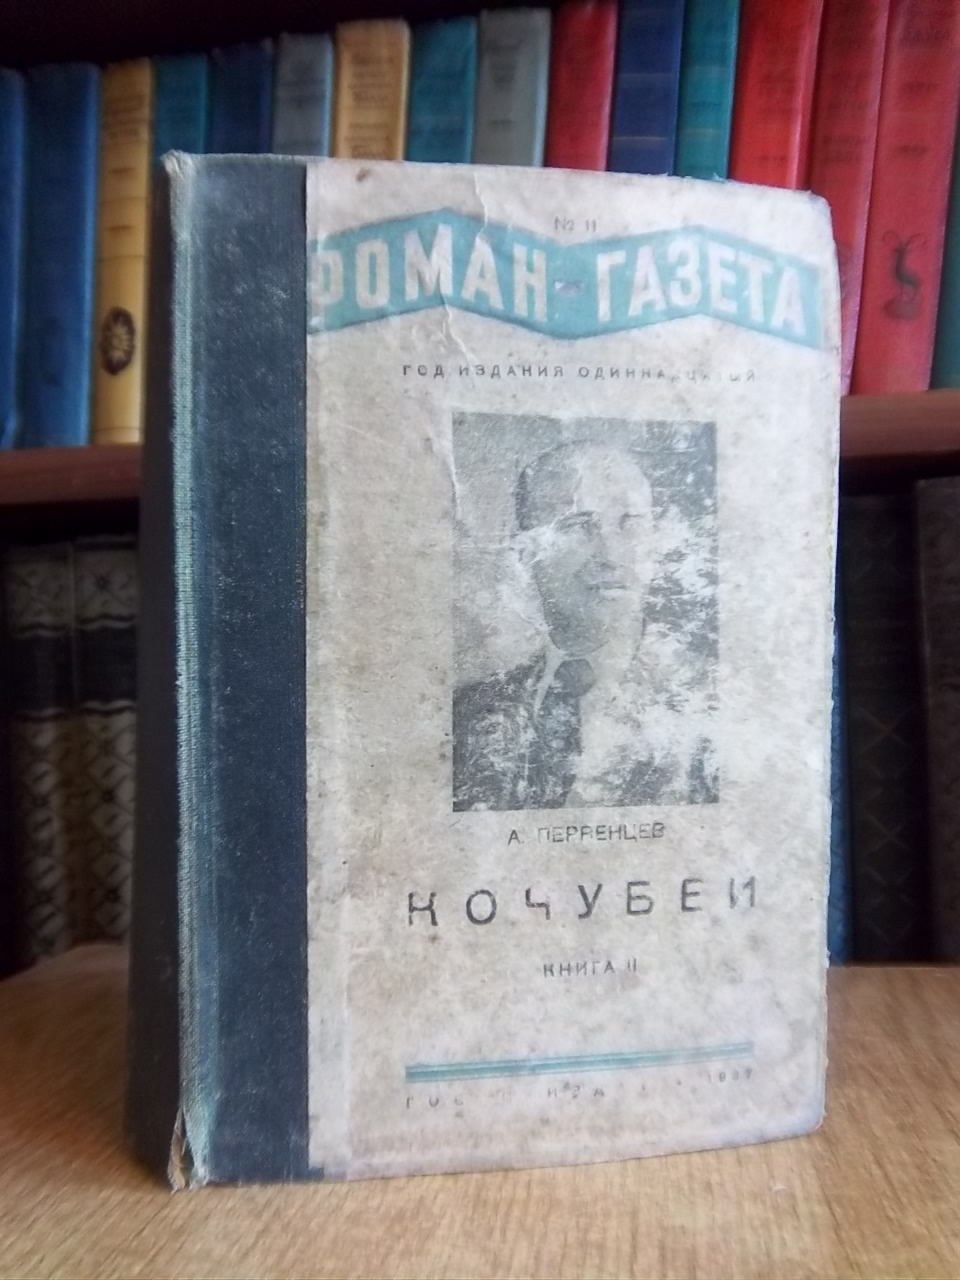 Роман-газета №№ 1/1934г, 4, 5, 9, 11/1937г